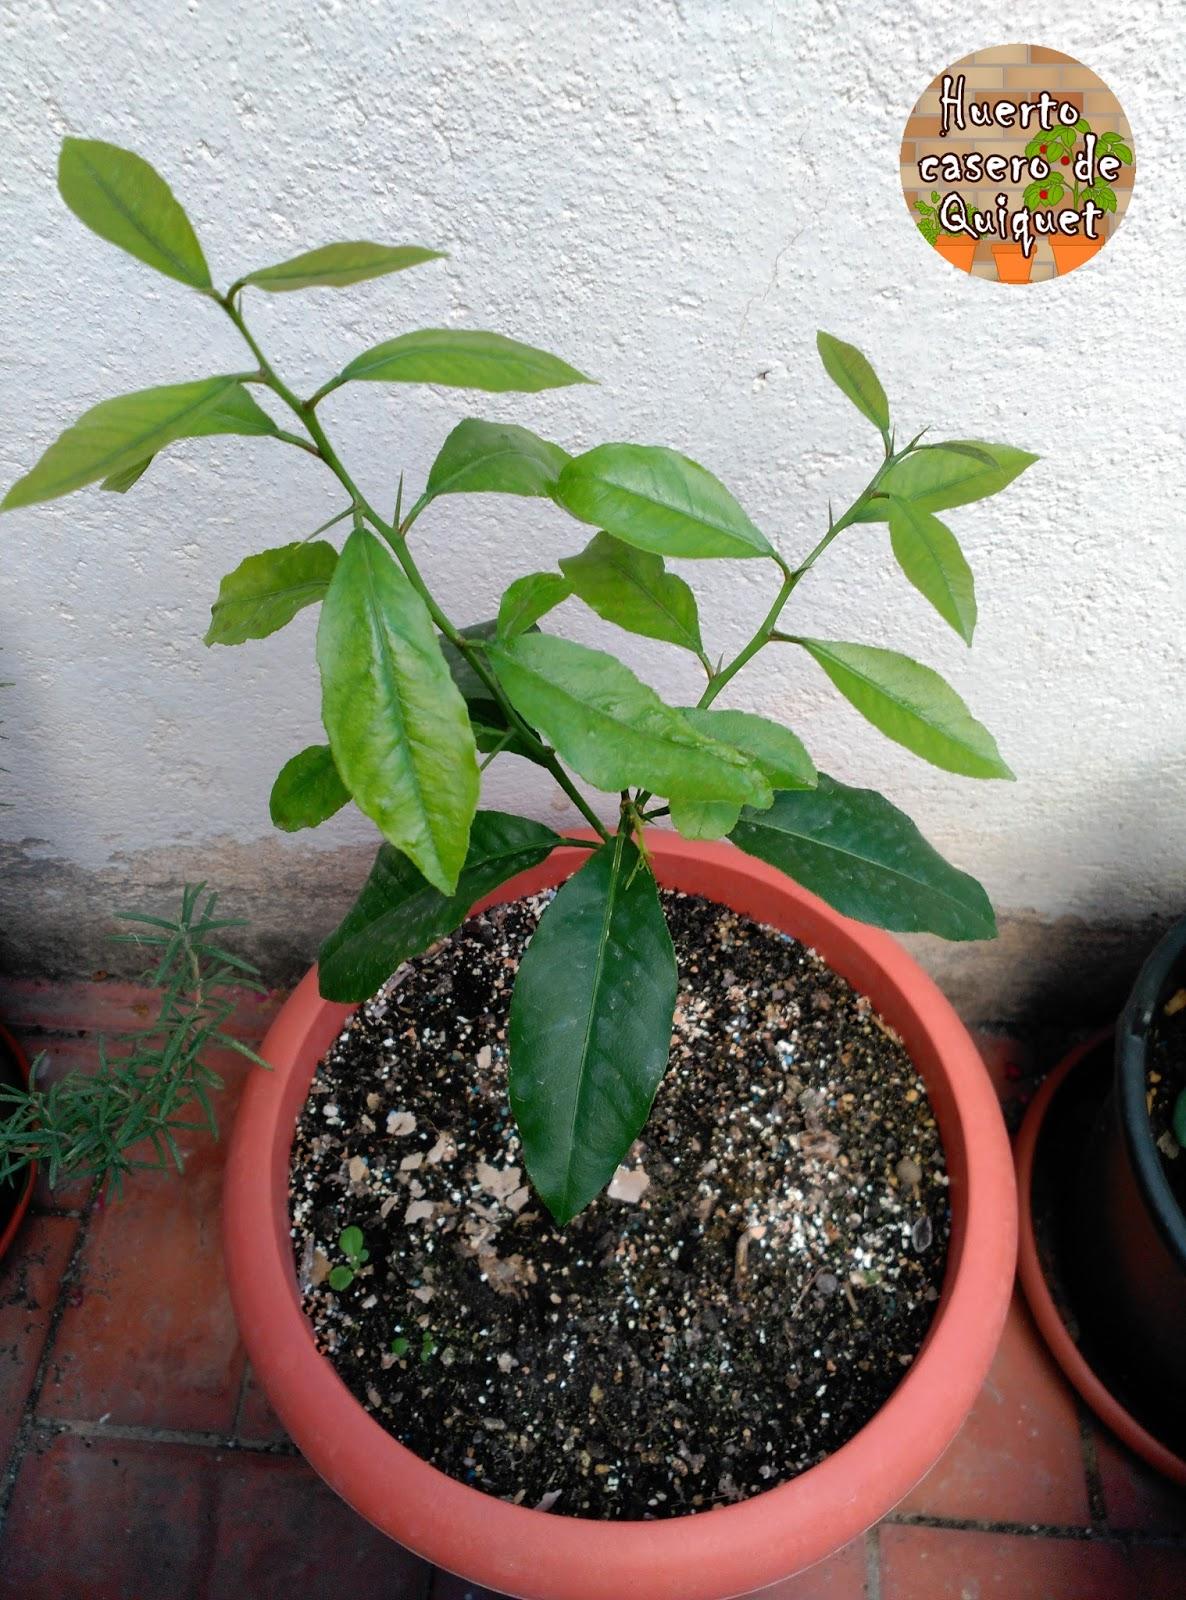 Huerto casero de quiquet como plantar un limonero en nuestro huerto casero - Plantar limonero en maceta ...